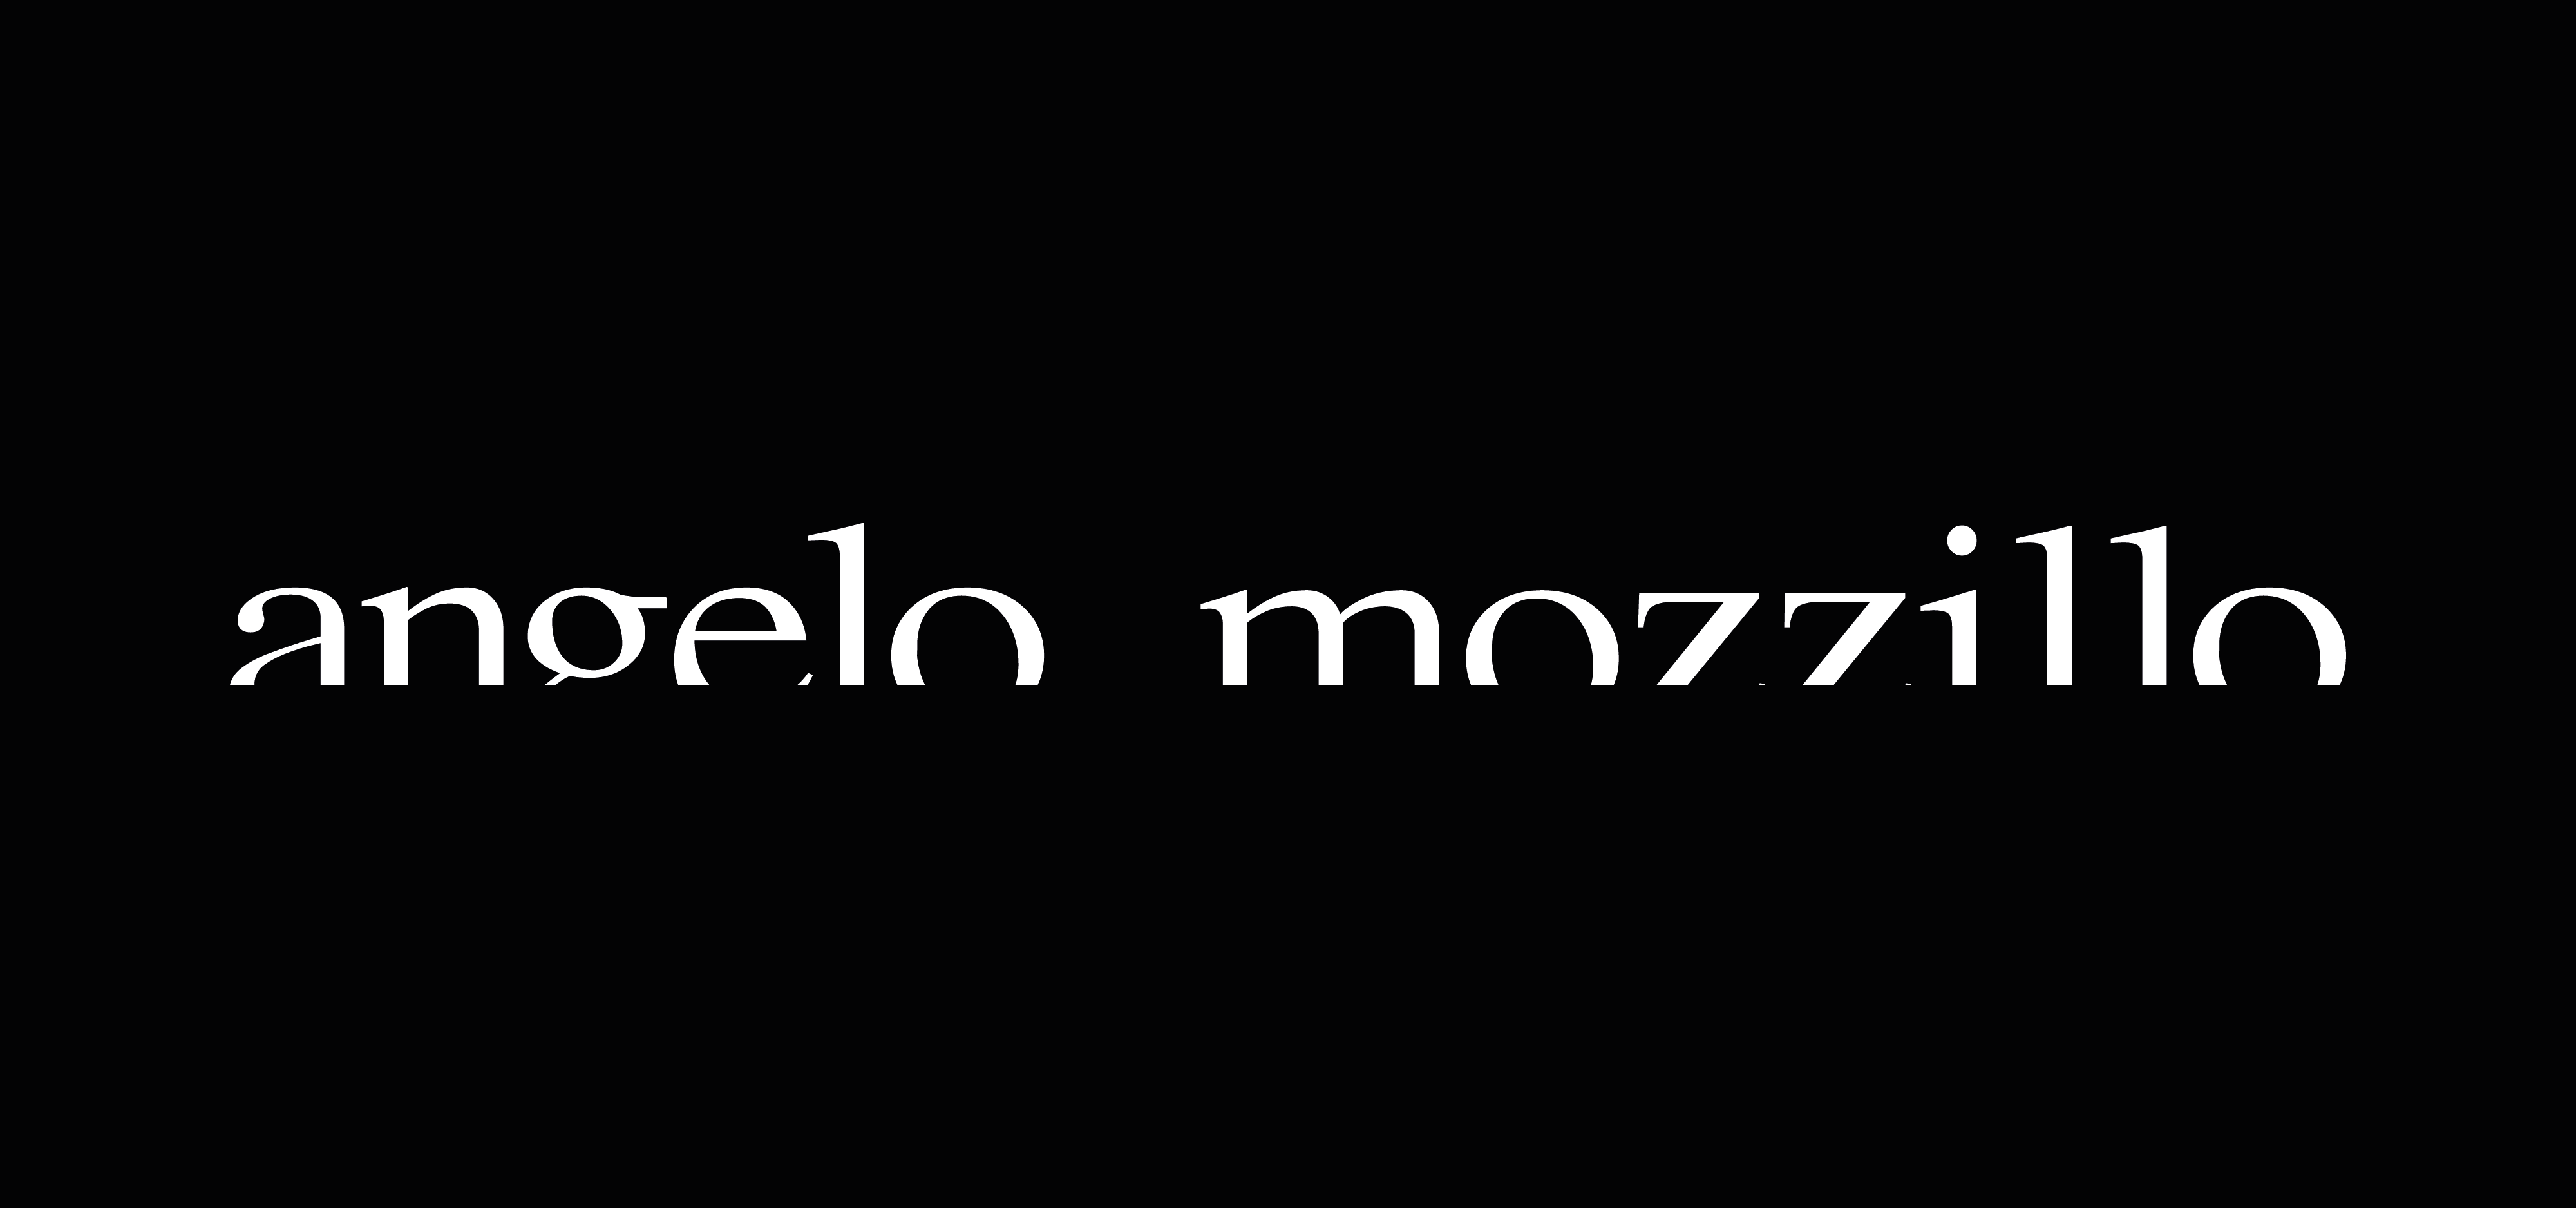 mozzillo-01